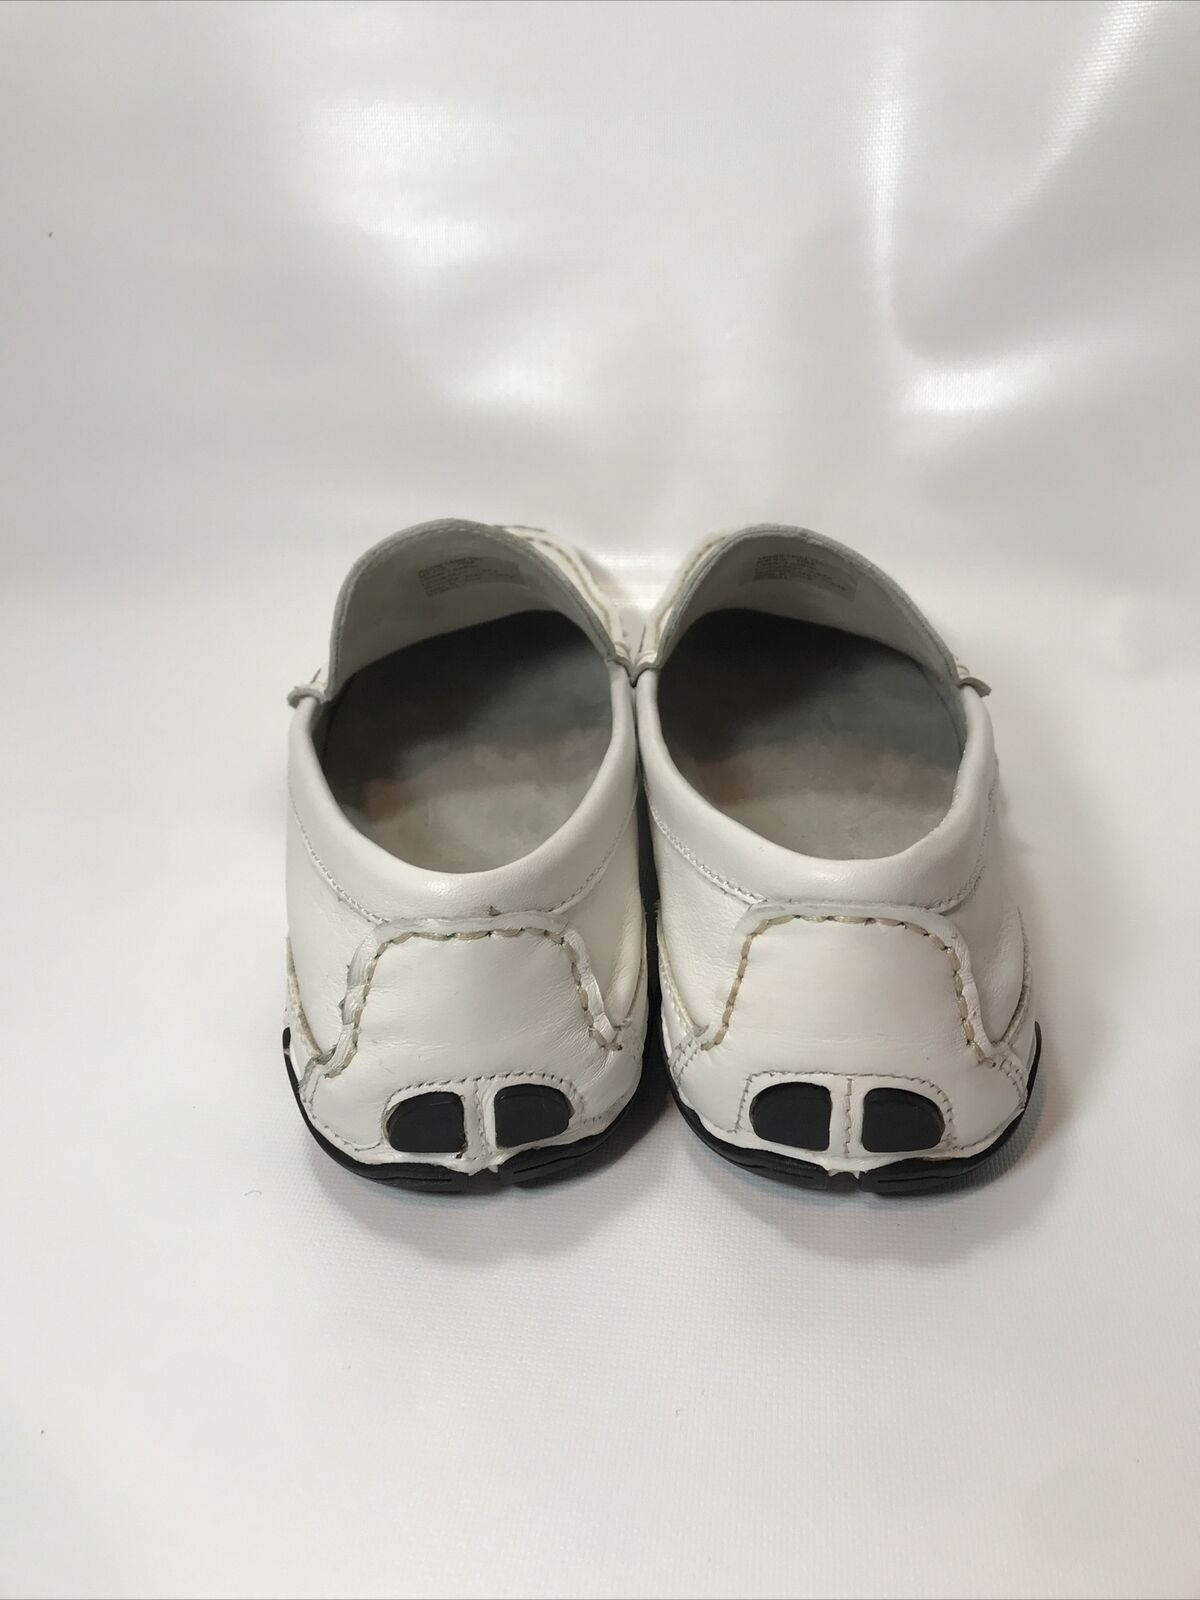 Kenneth Cole Reaction Men's Dress Shoes White Size 10M